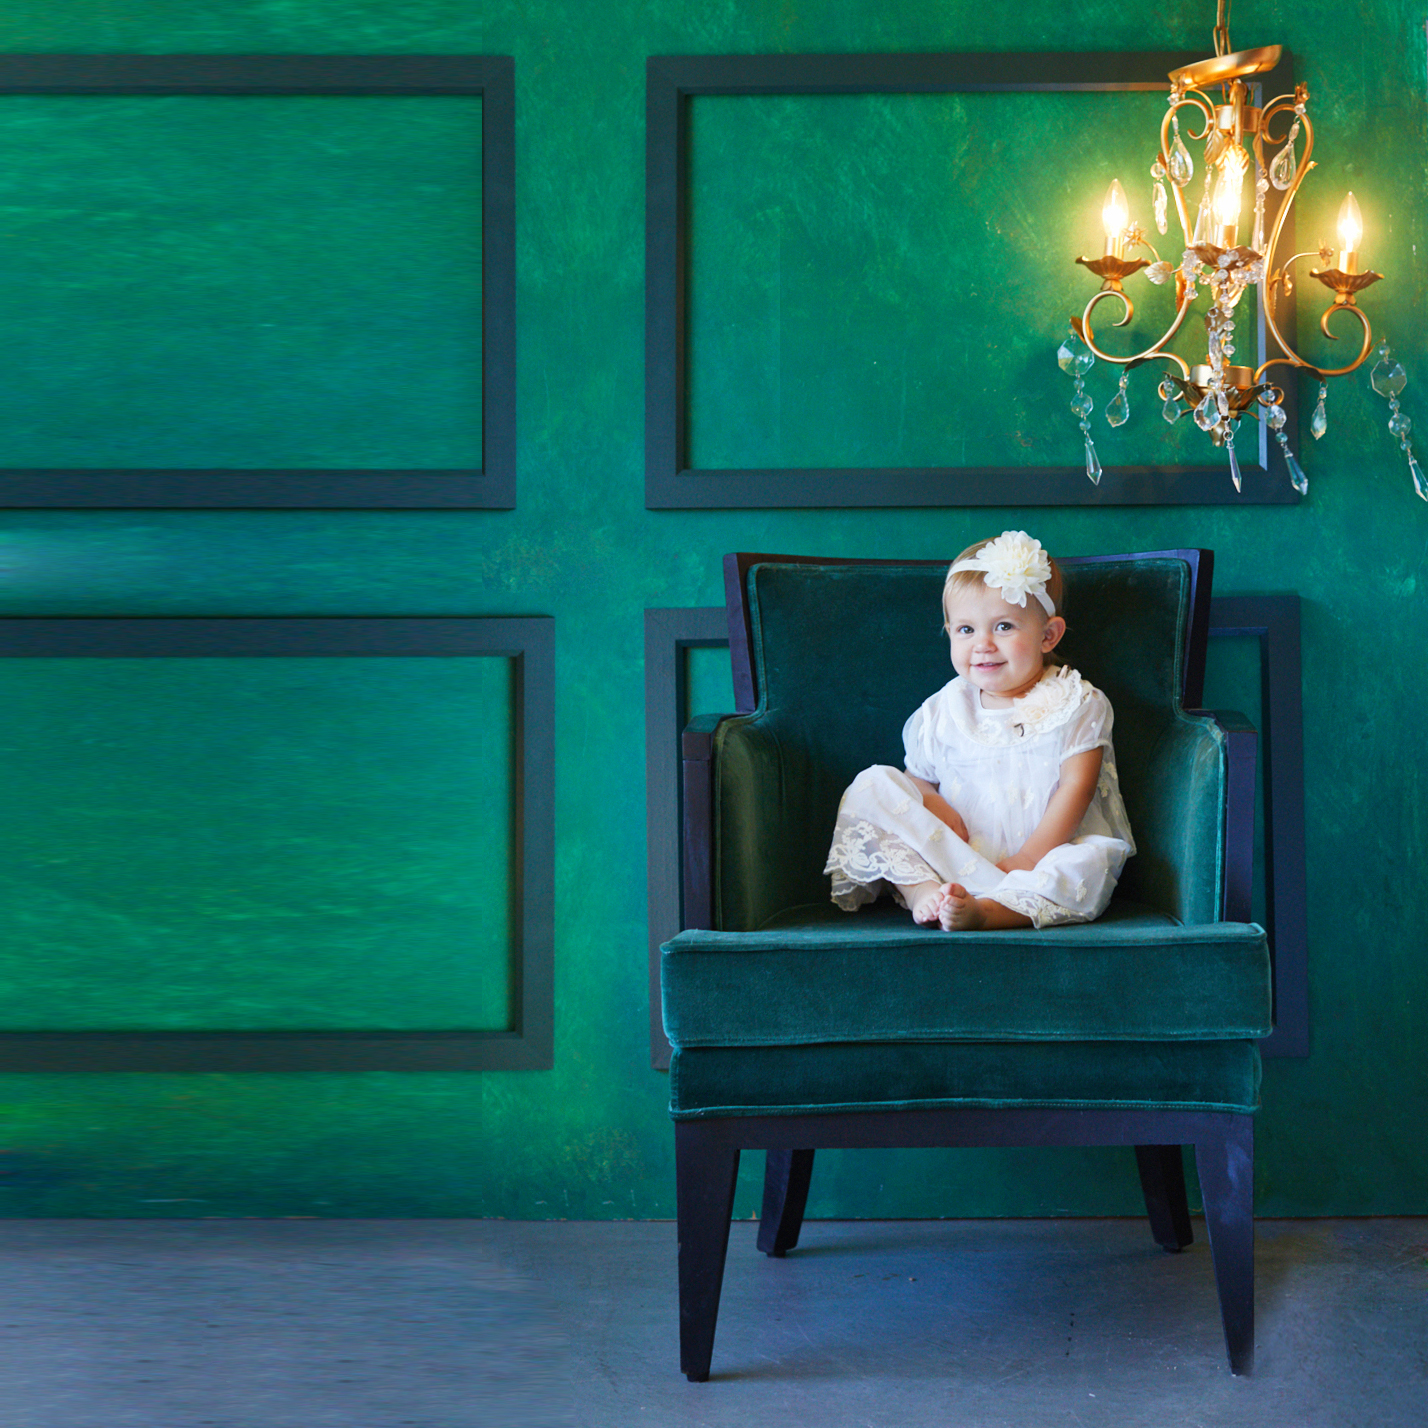 Emerald Jewel Box simple and elegant